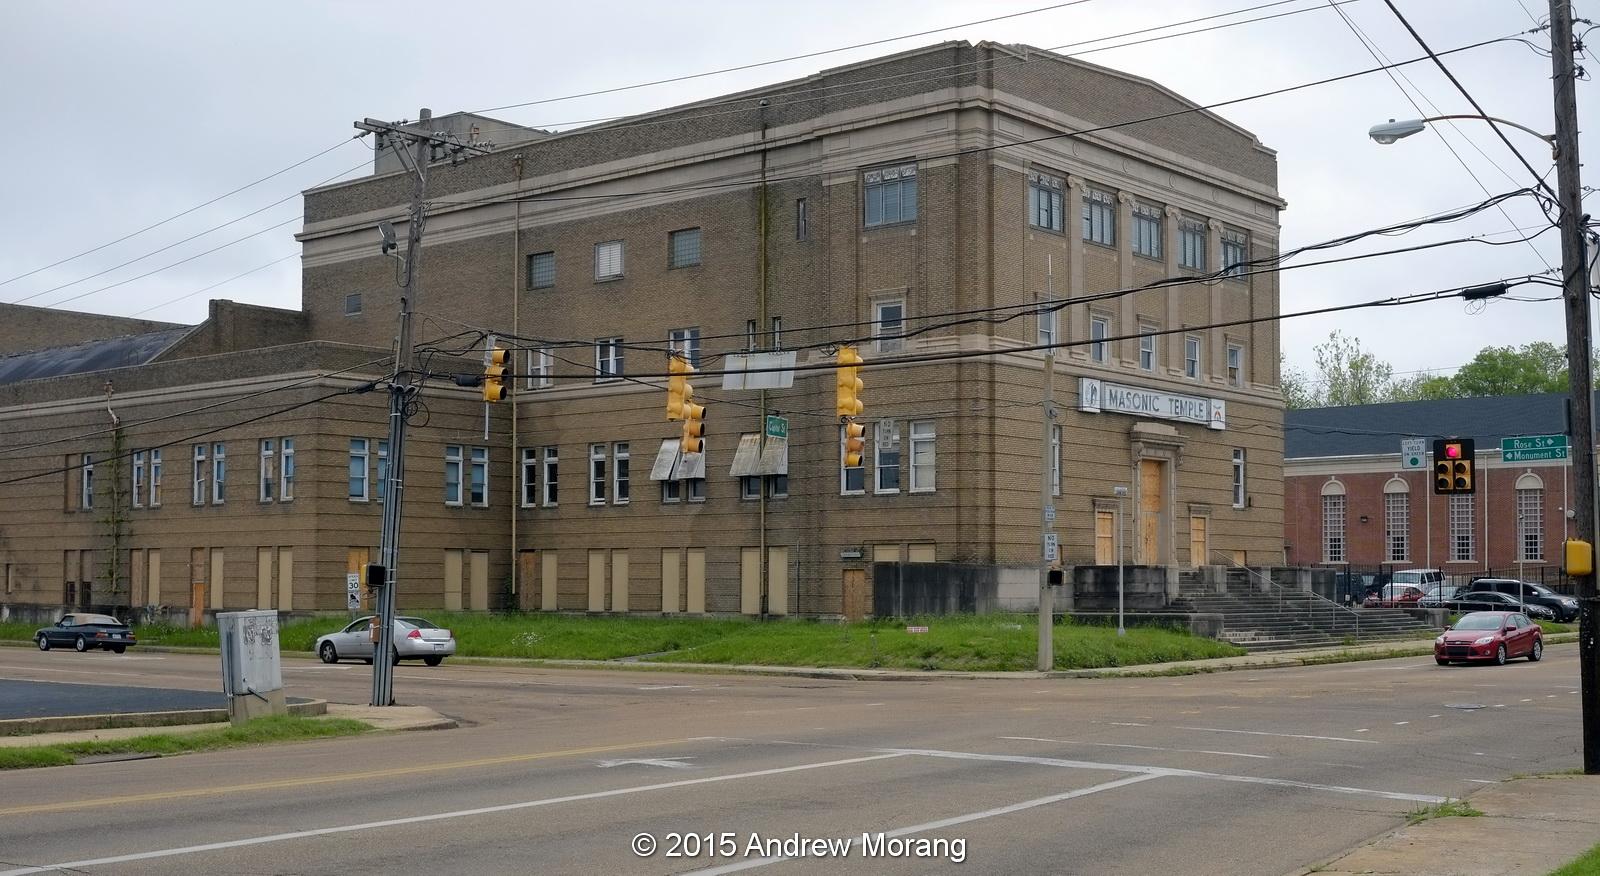 Urban Decay: Abandoned Masonic Temple, West Capitol Street